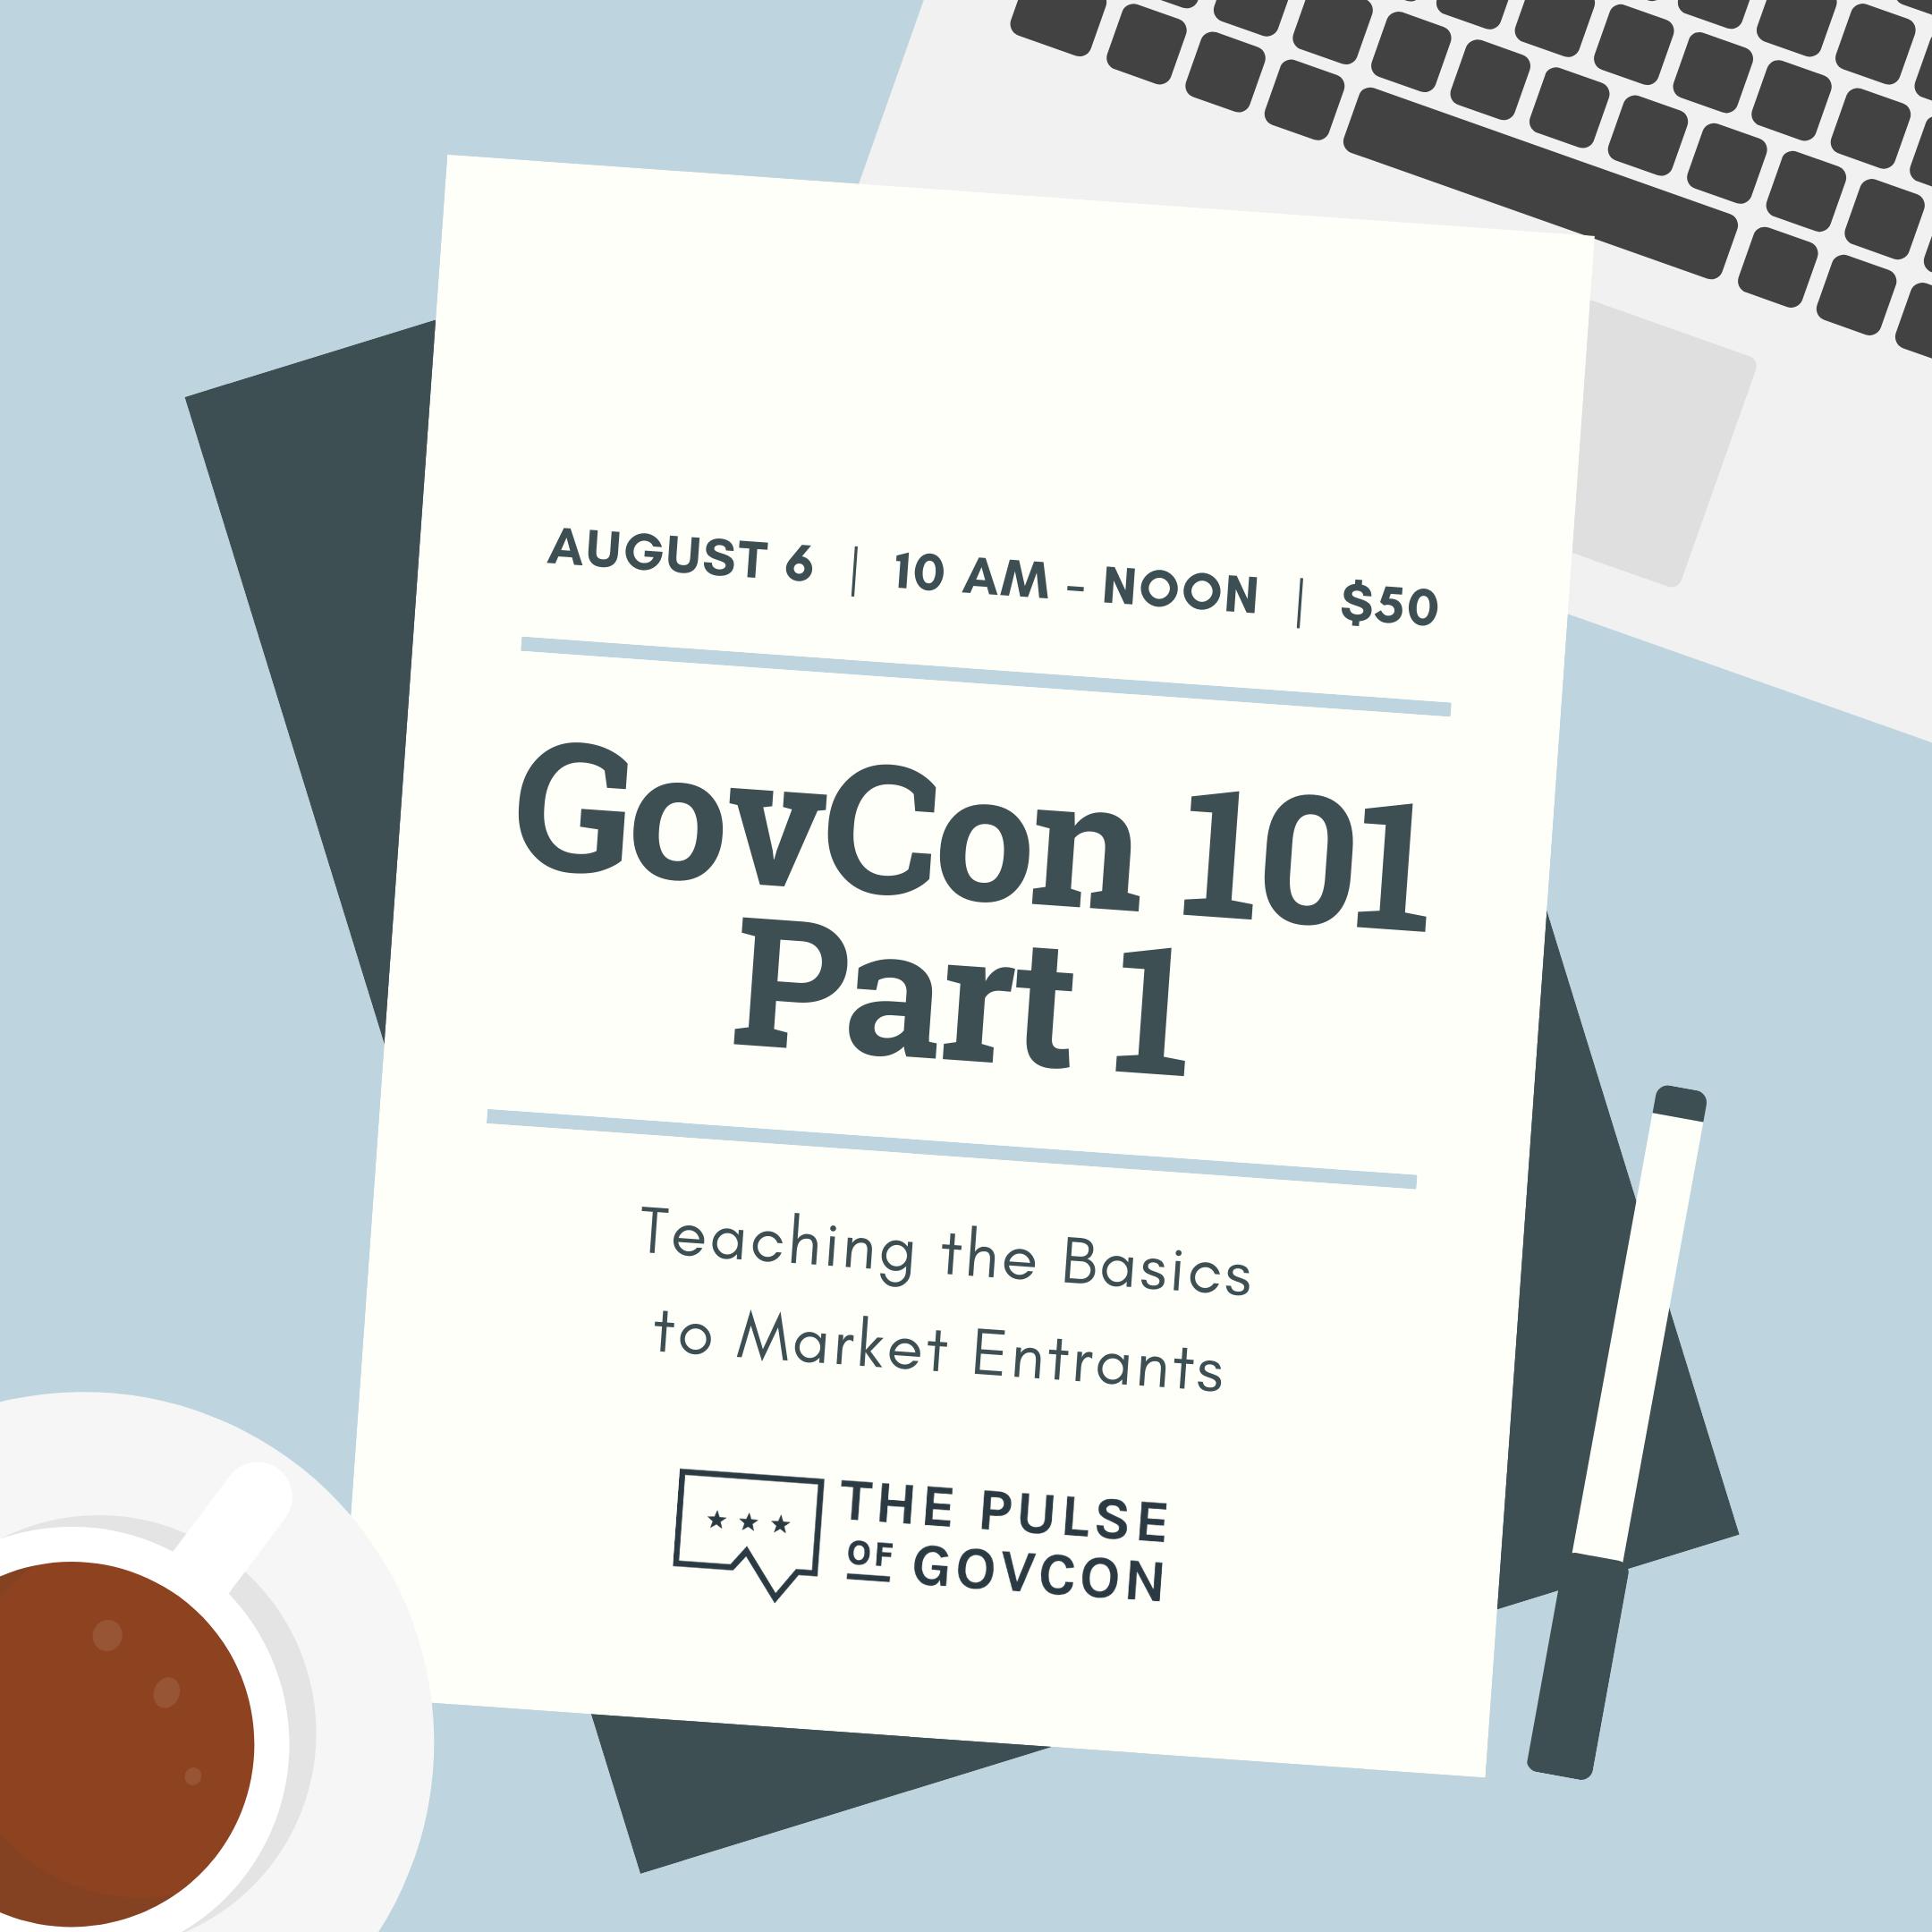 Virtual Training: GovCon 101 Pt. 1